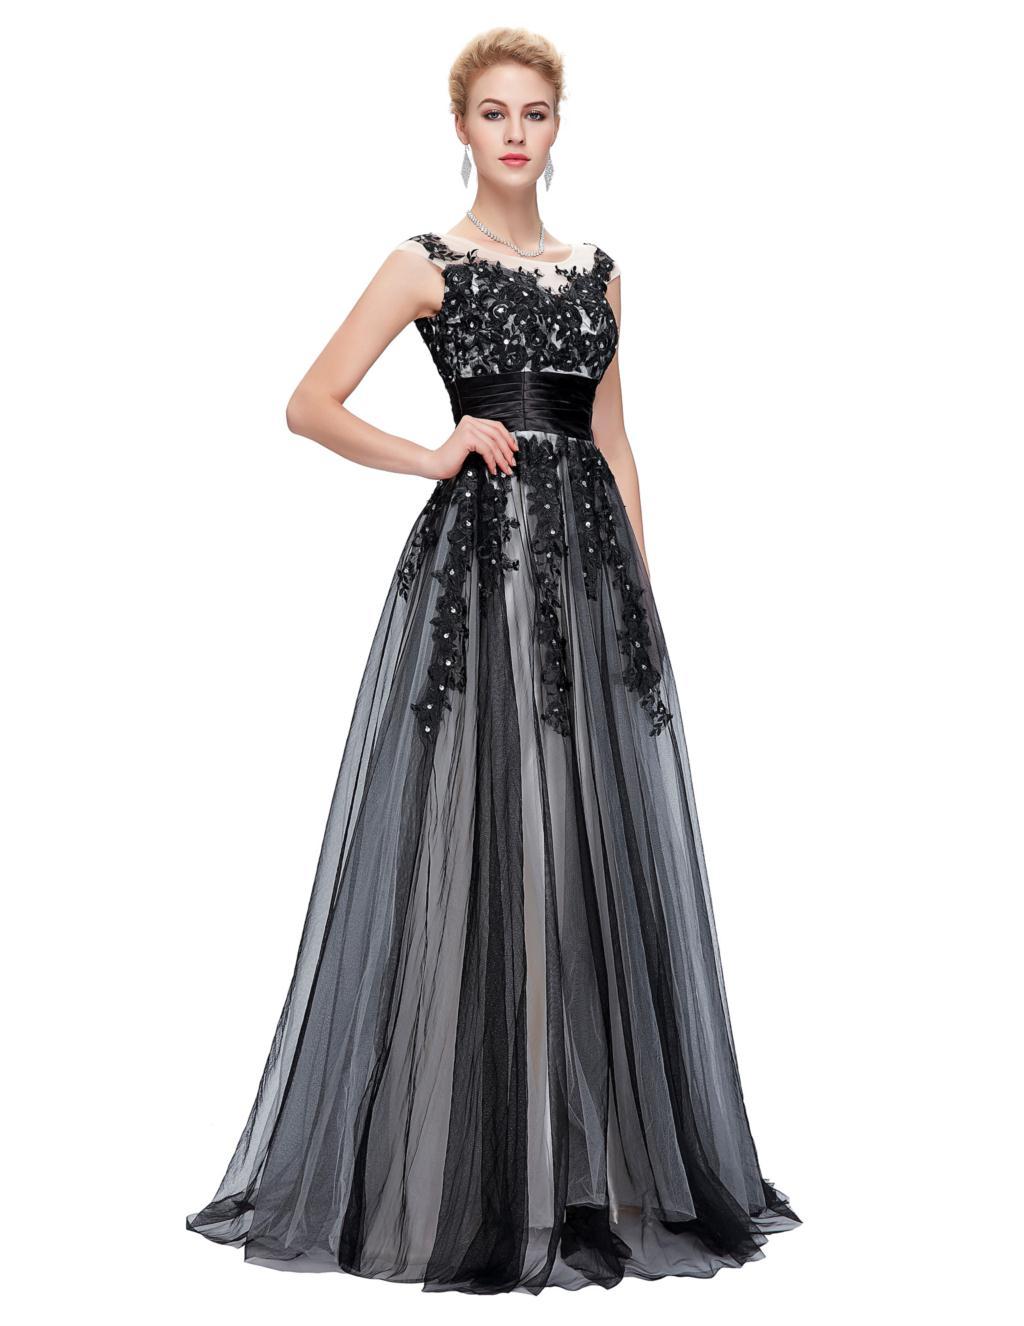 Elegant Lace Appliques Mother of the Bride Dress 6